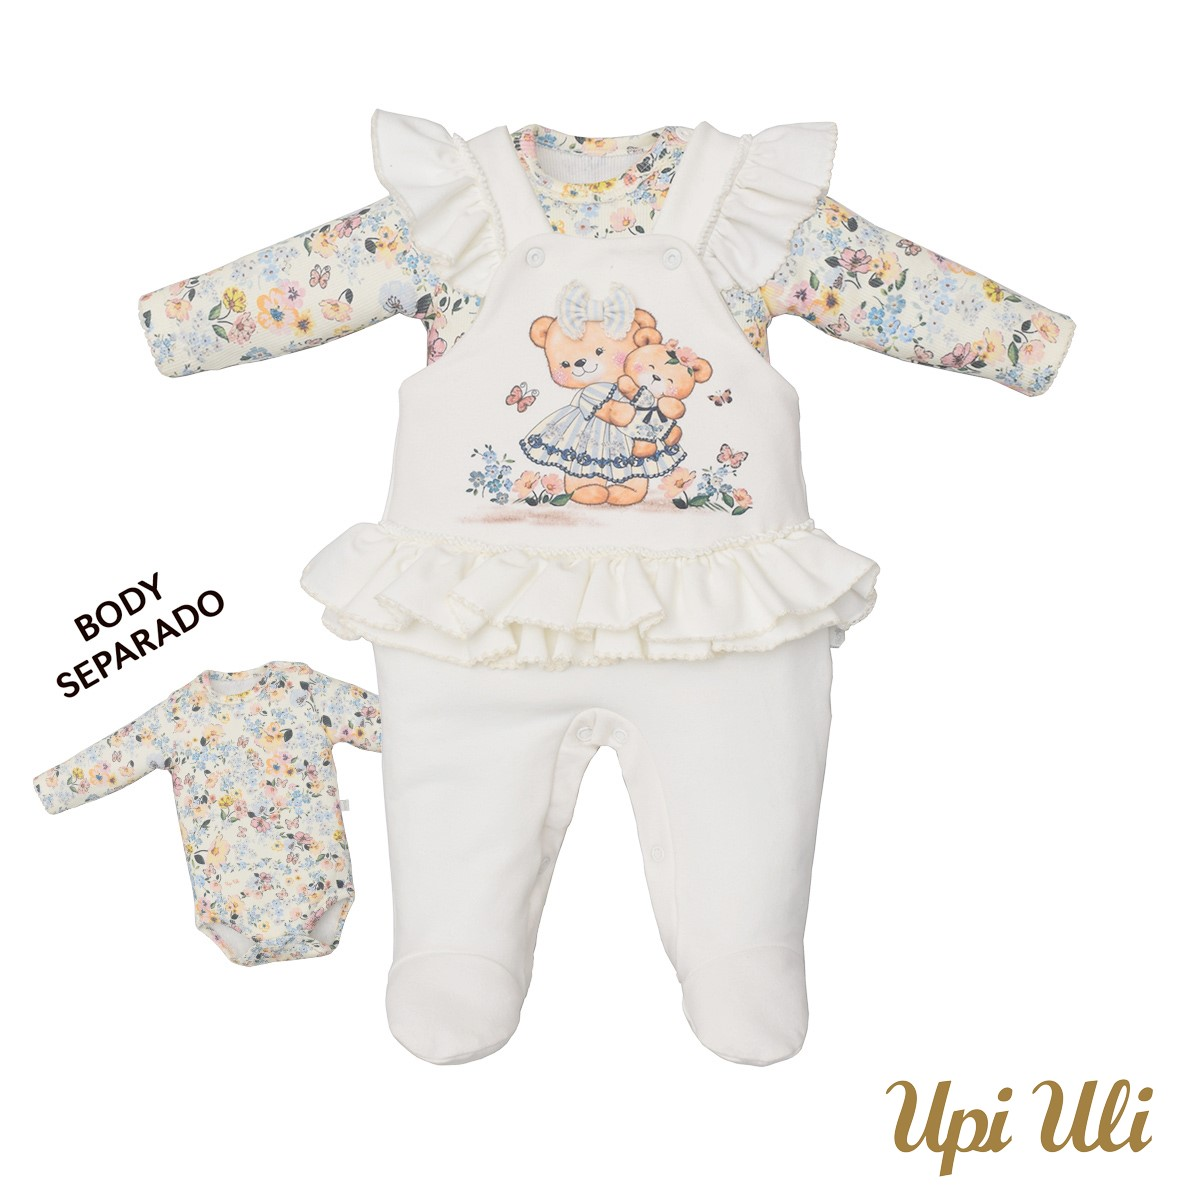 Macacão De Bebê Suedine/Ribana Moni Alice